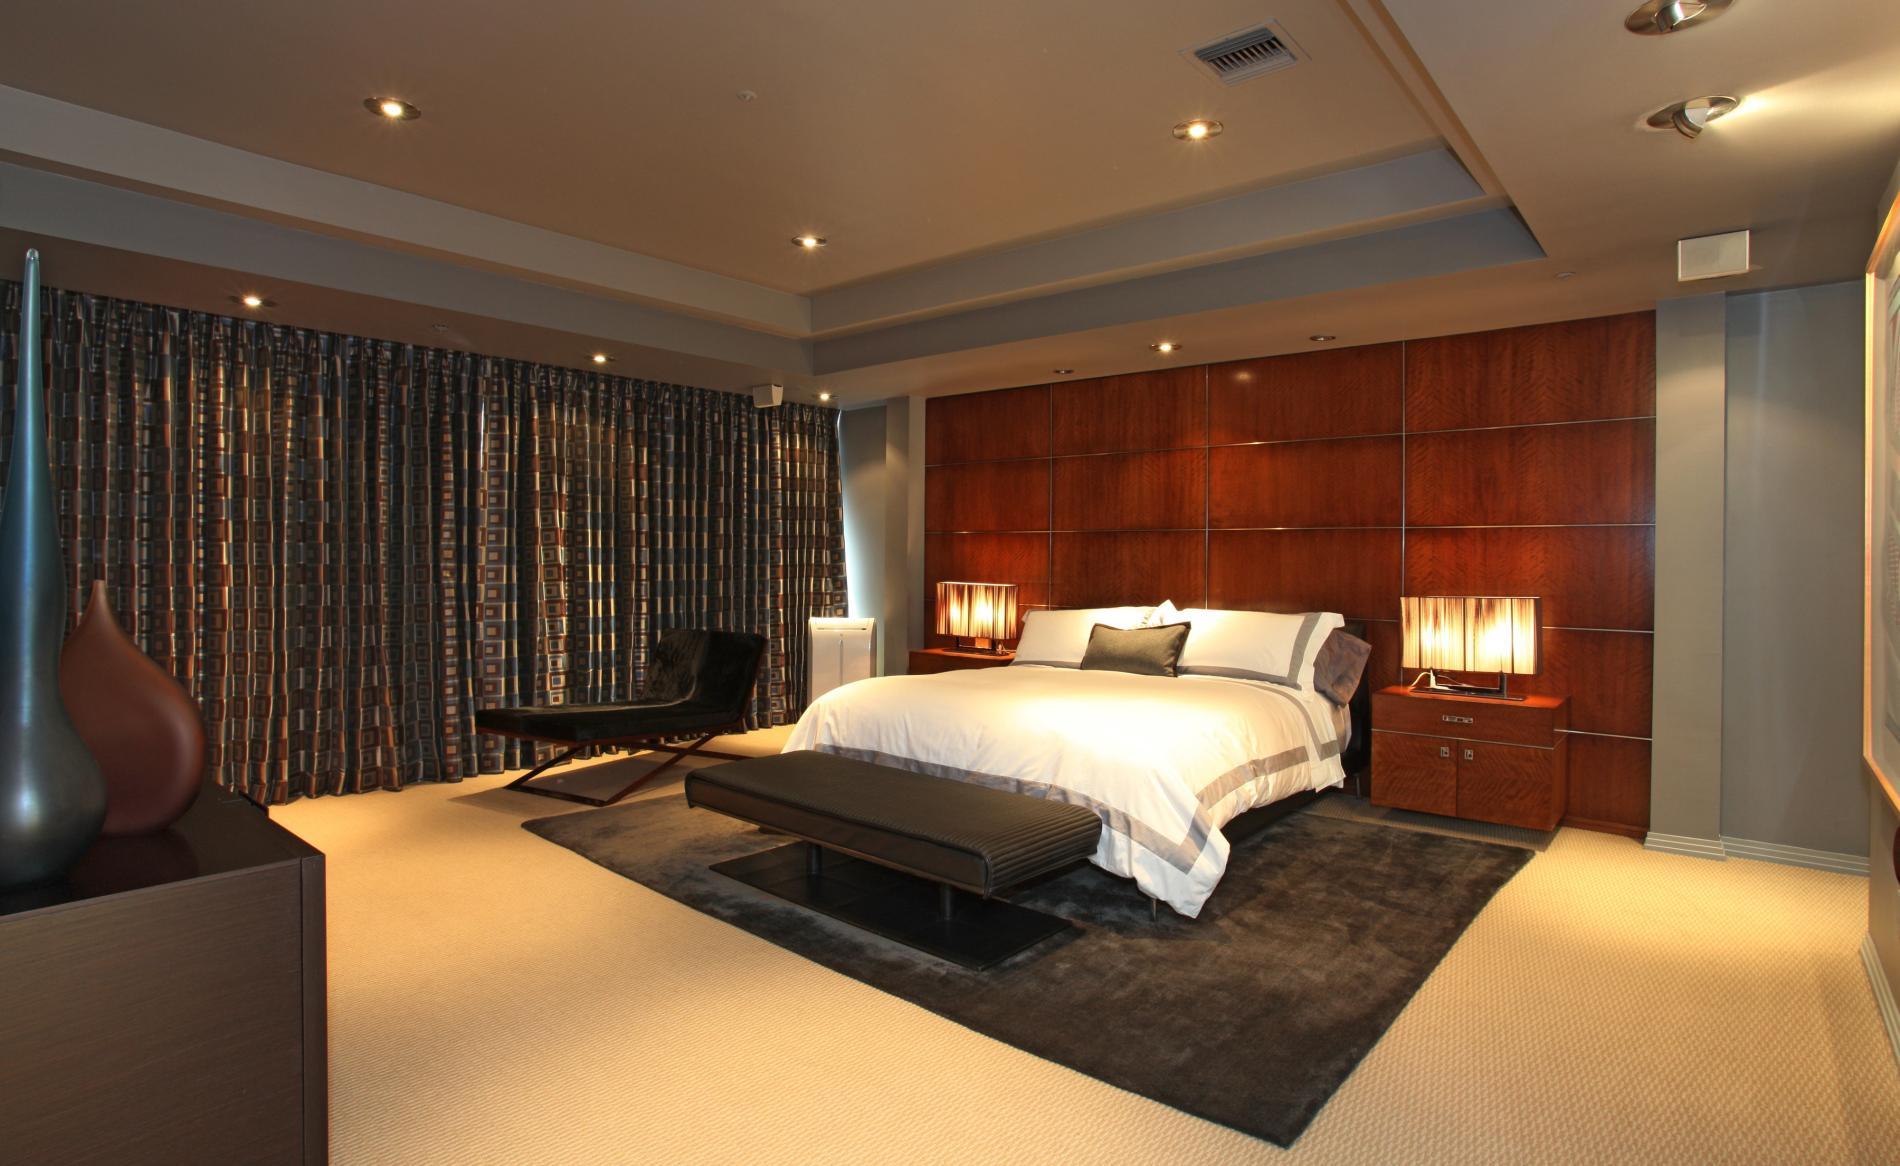 28 Amazing Master Bedroom Design Ideas